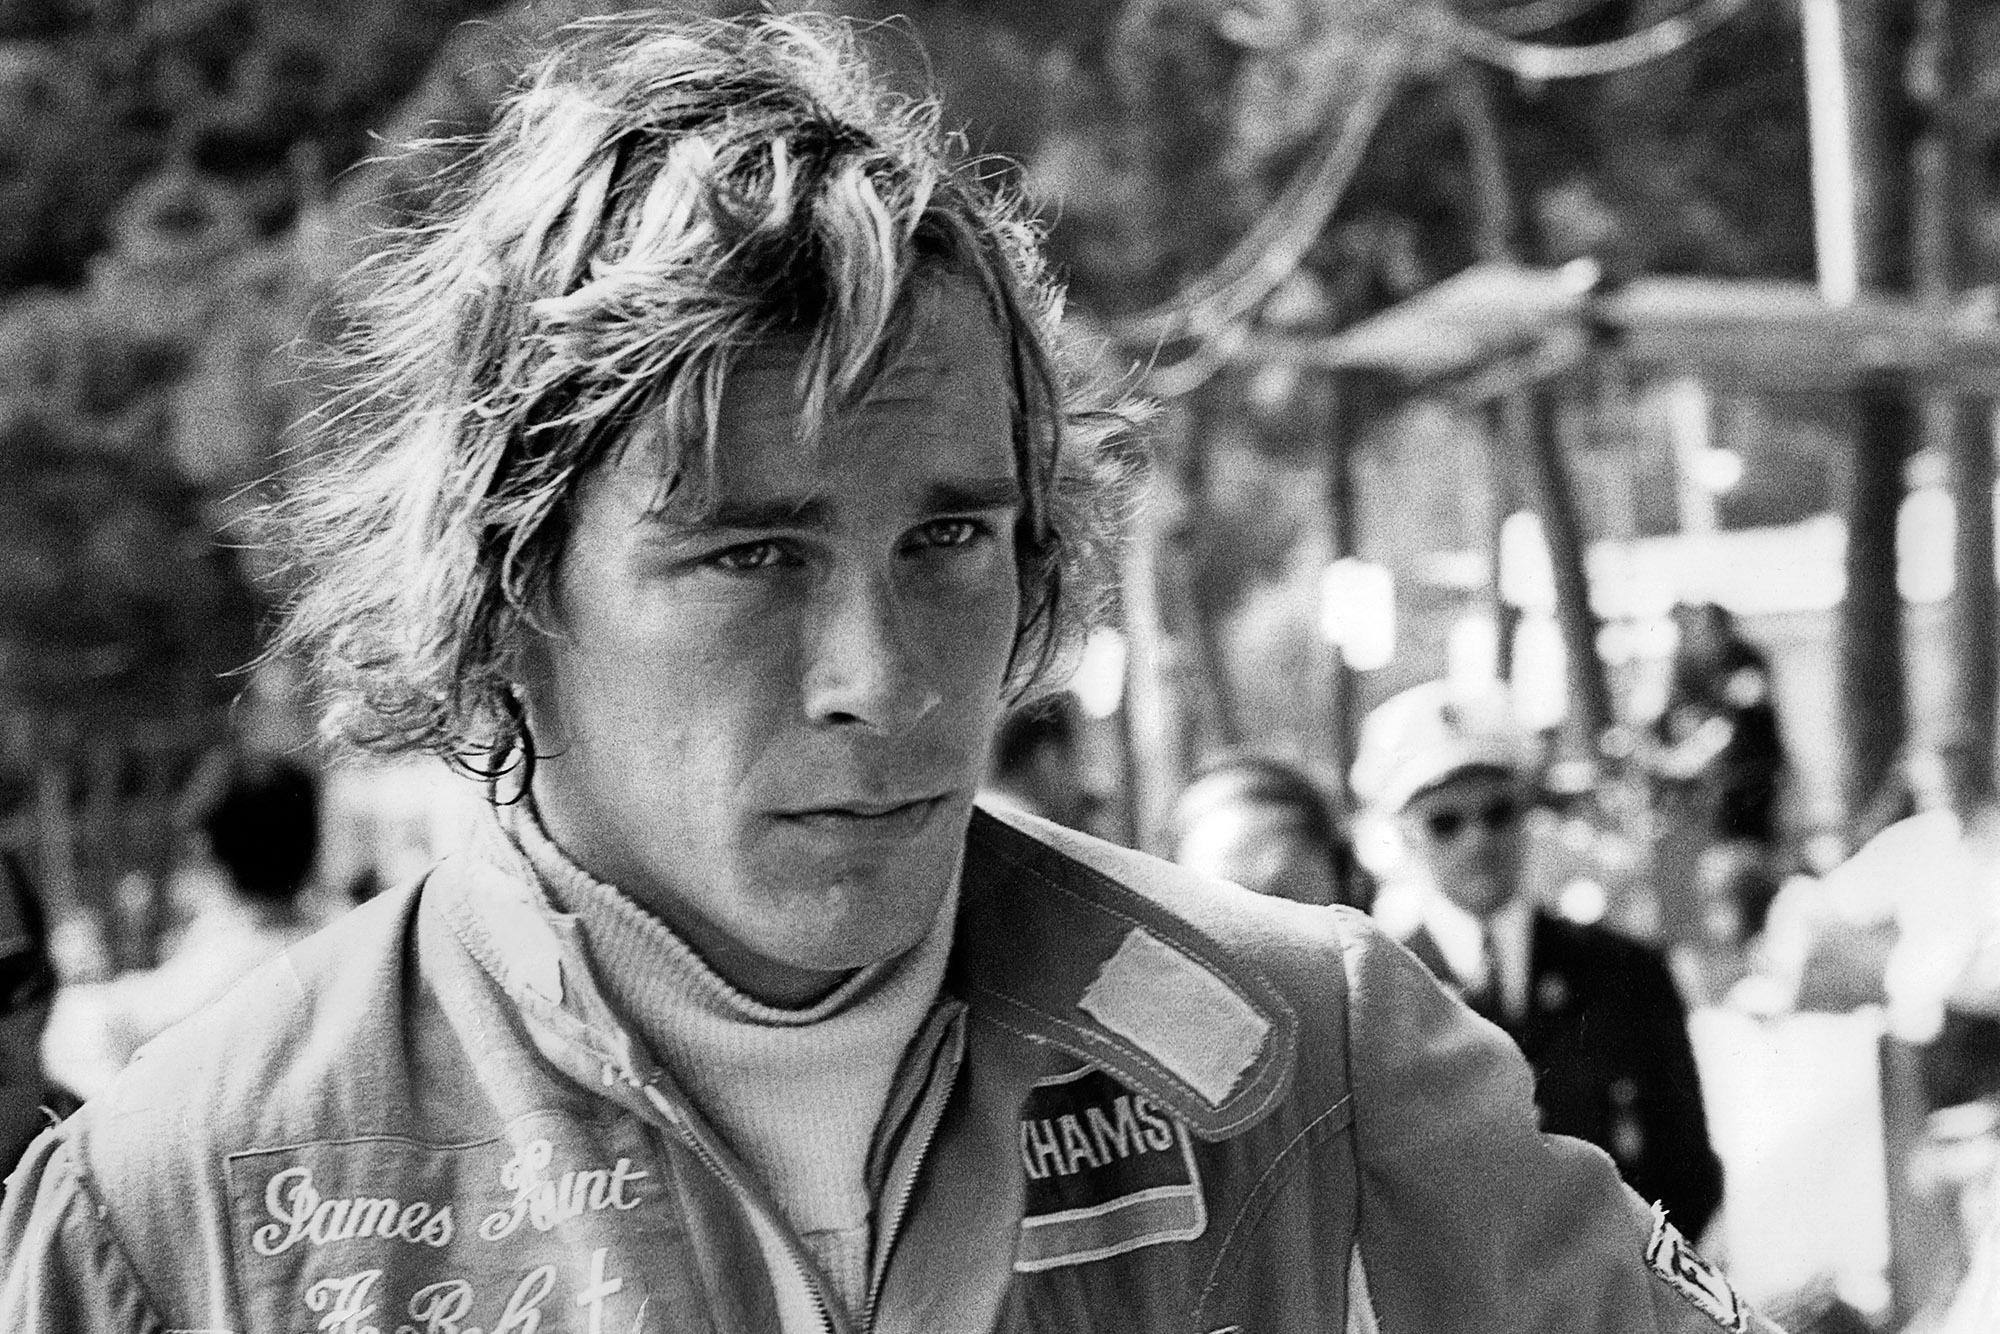 James Hunt, Grand Prix of Monaco, Monaco, 26 May 1974